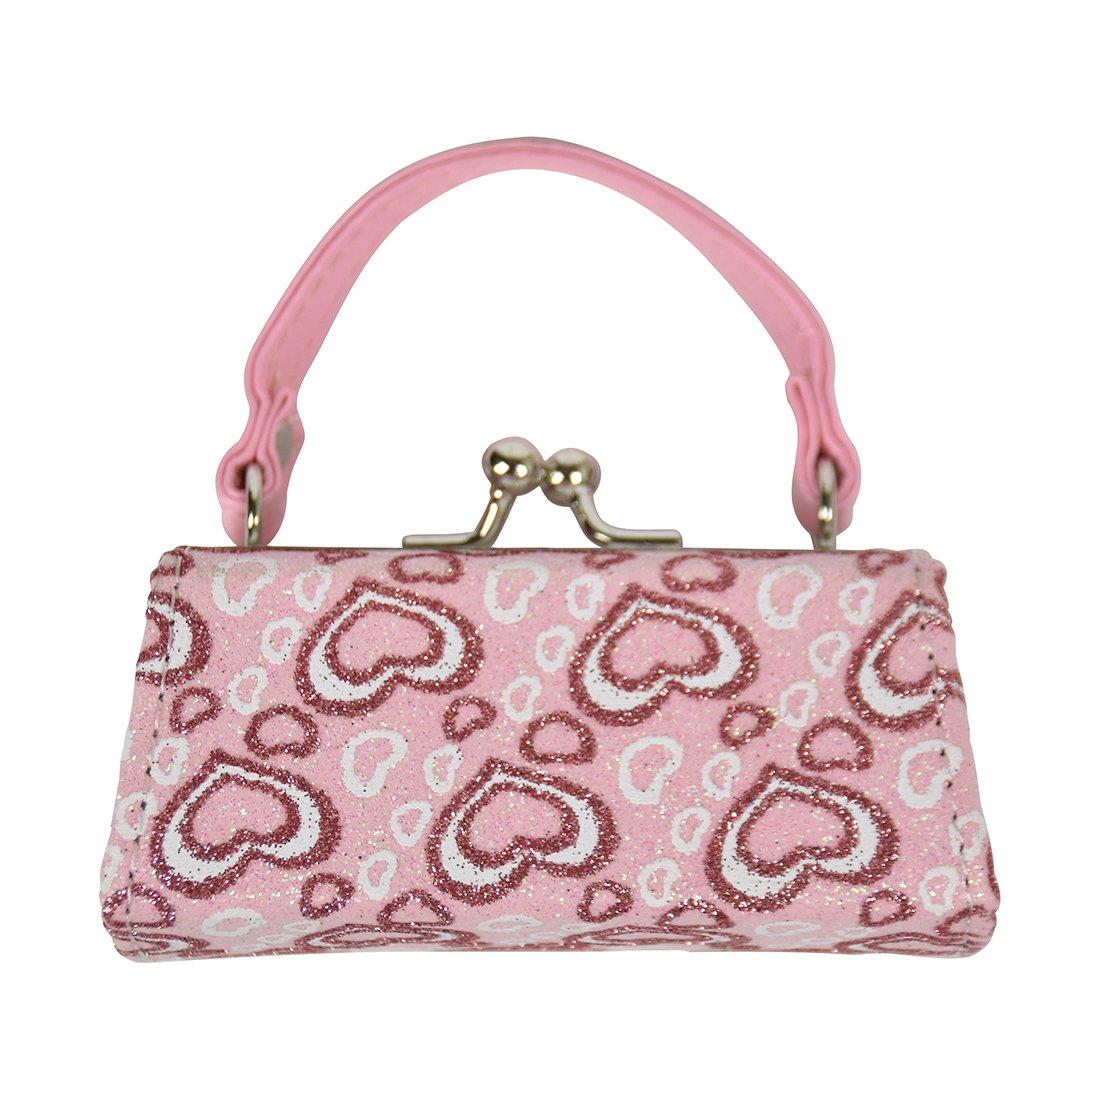 8633d012de9 Amazon.com : Glittery Hearts Lipstick Case with Handle Mini Purse - Light  Pink : Beauty